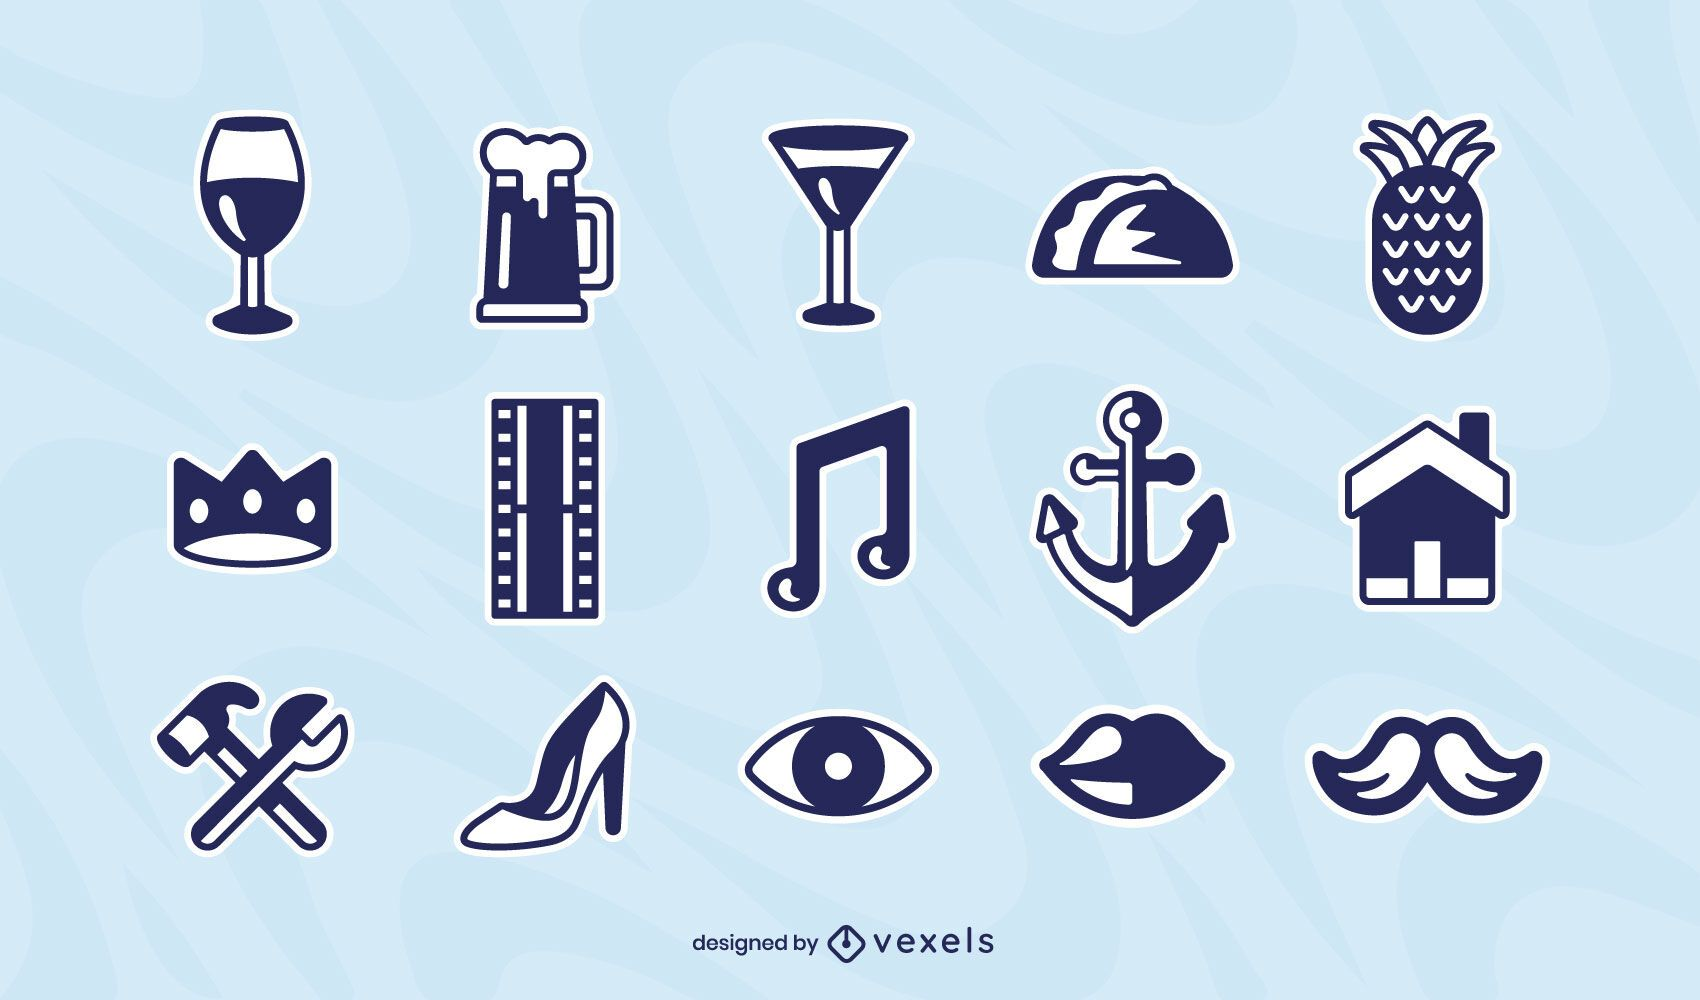 Misc elements icon set